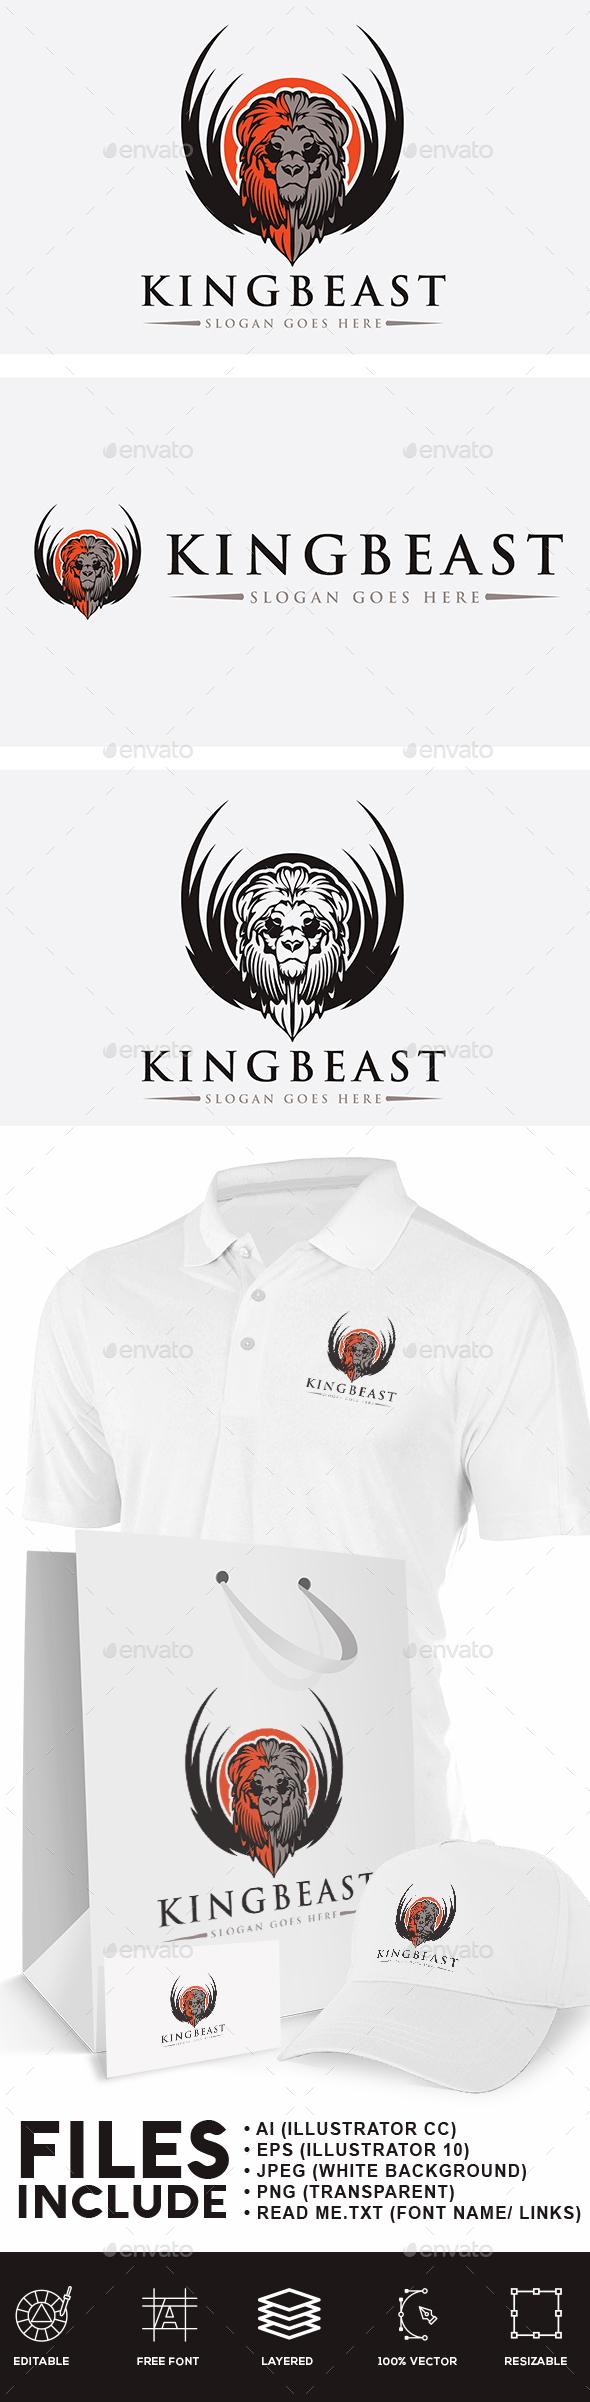 King Beast Logo - Animals Logo Templates